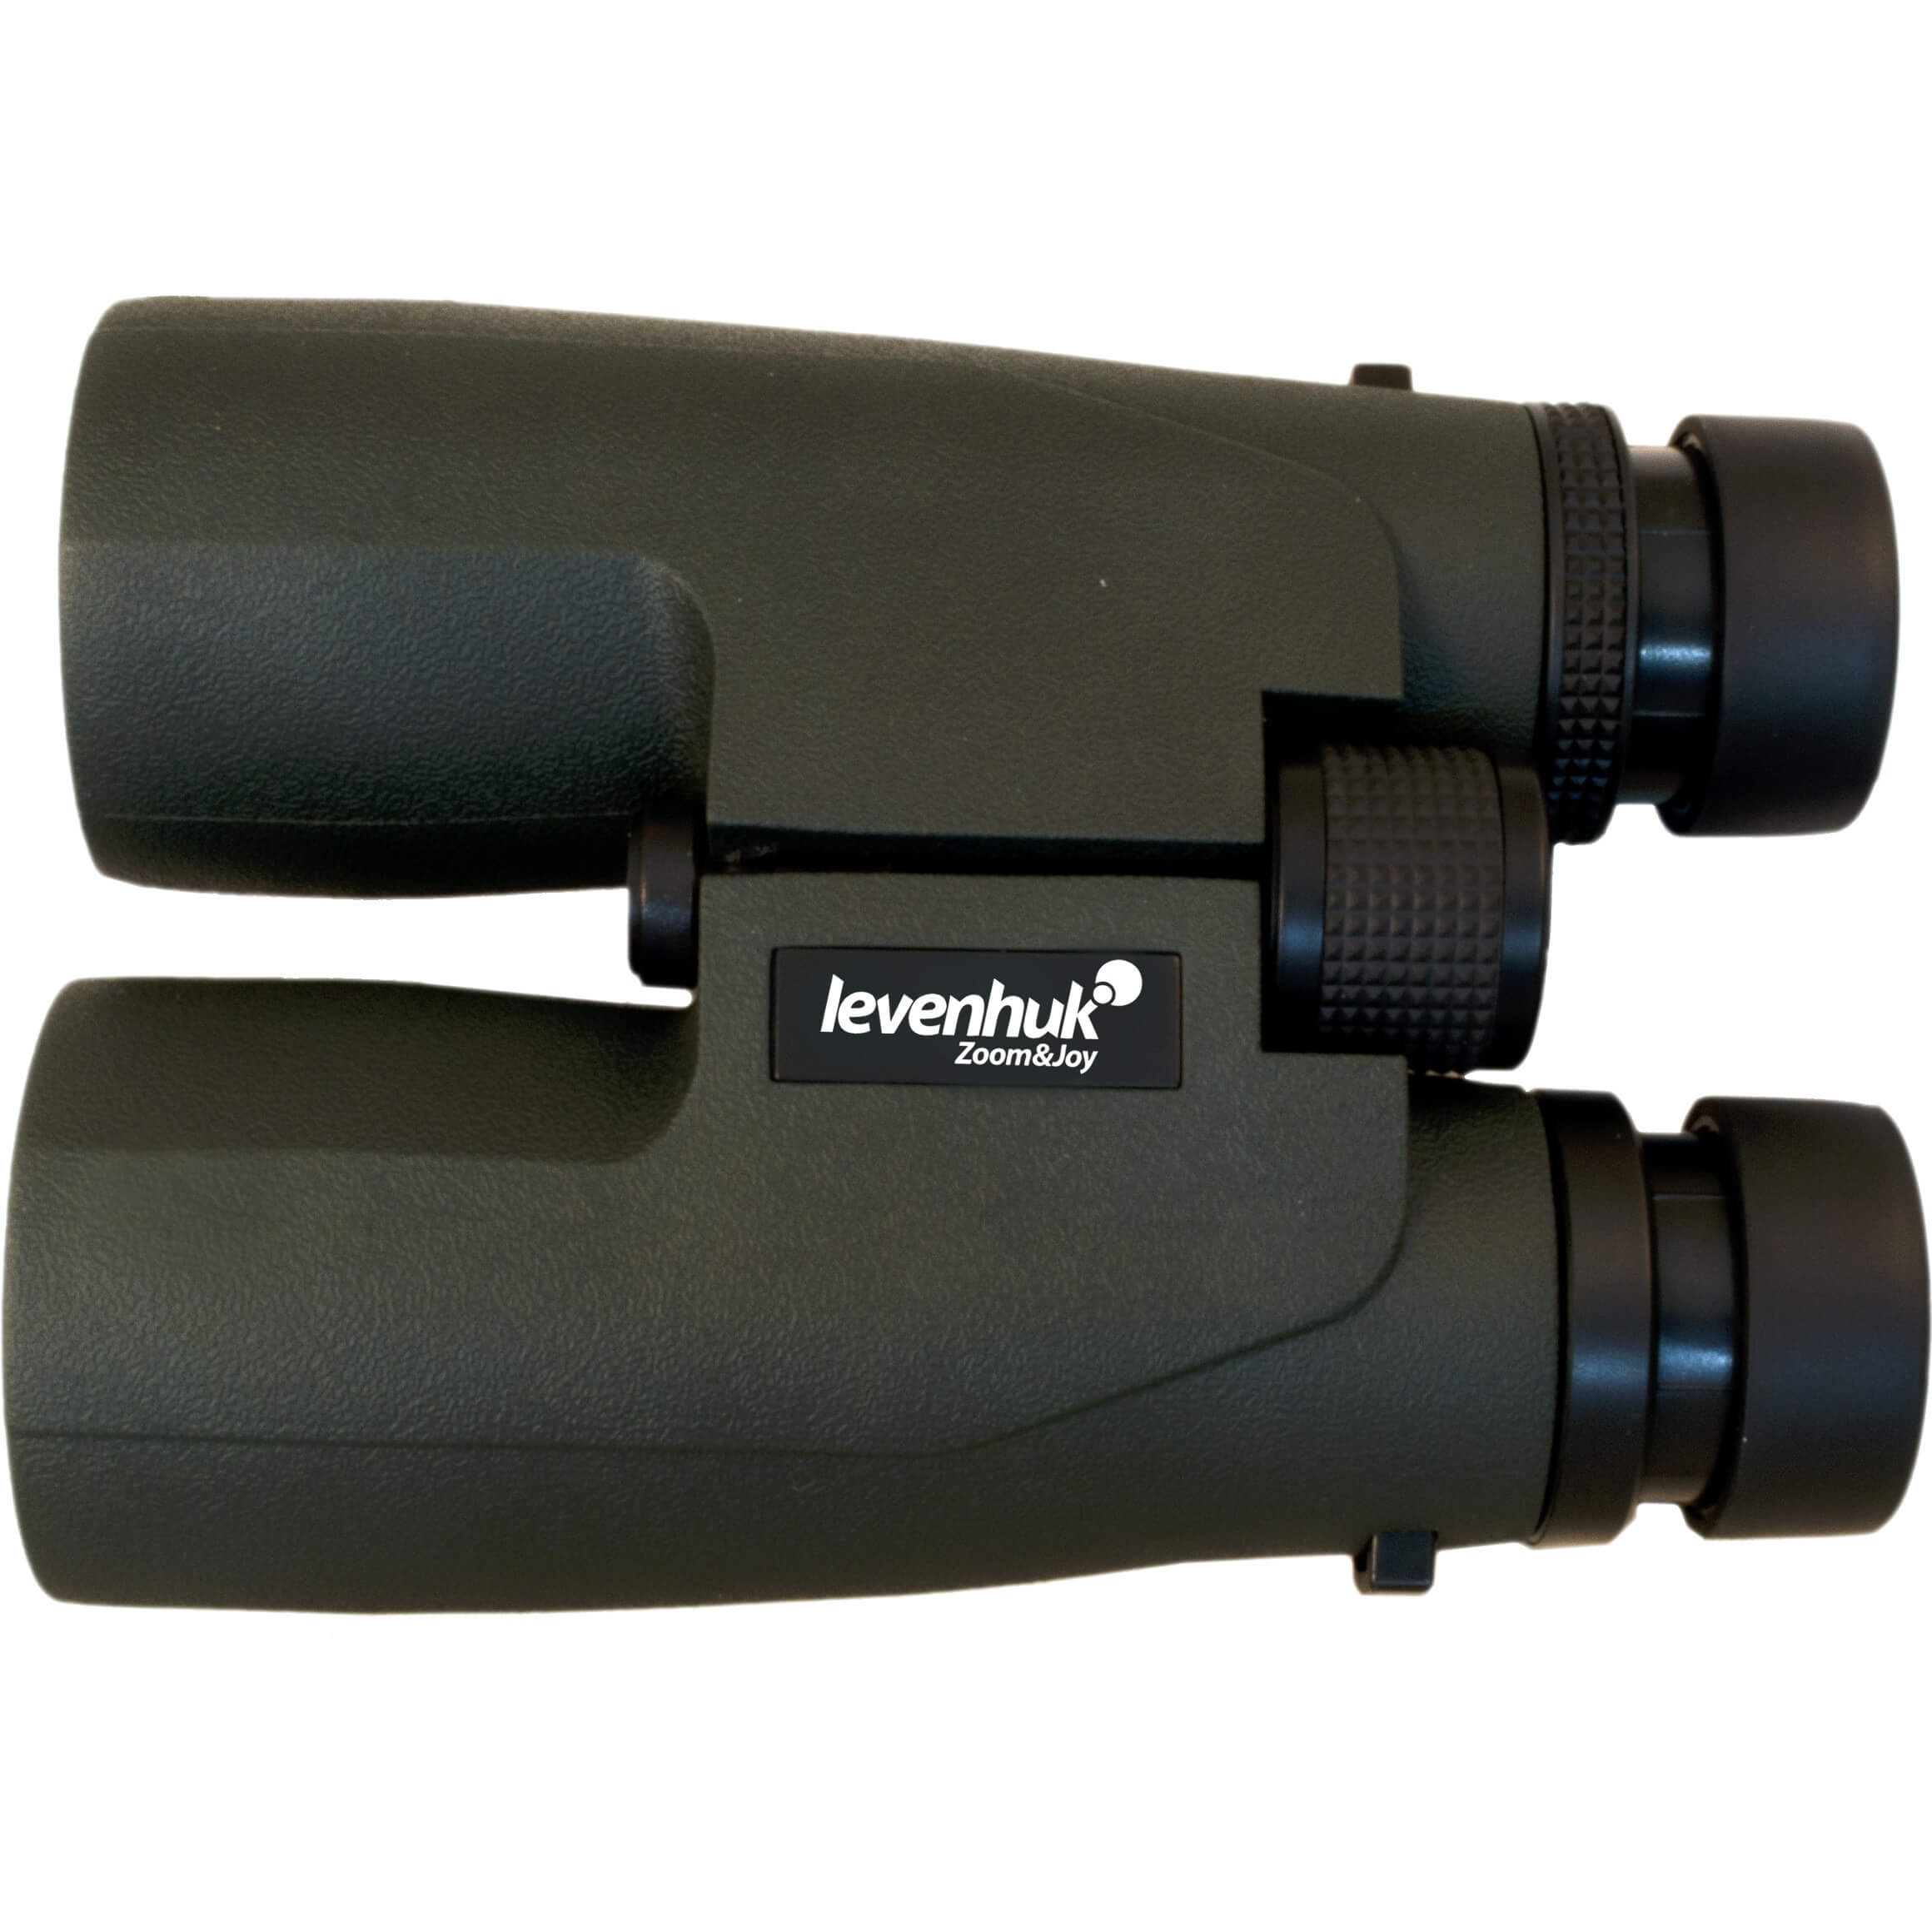 levenhuk 12x50 focus and eyecups